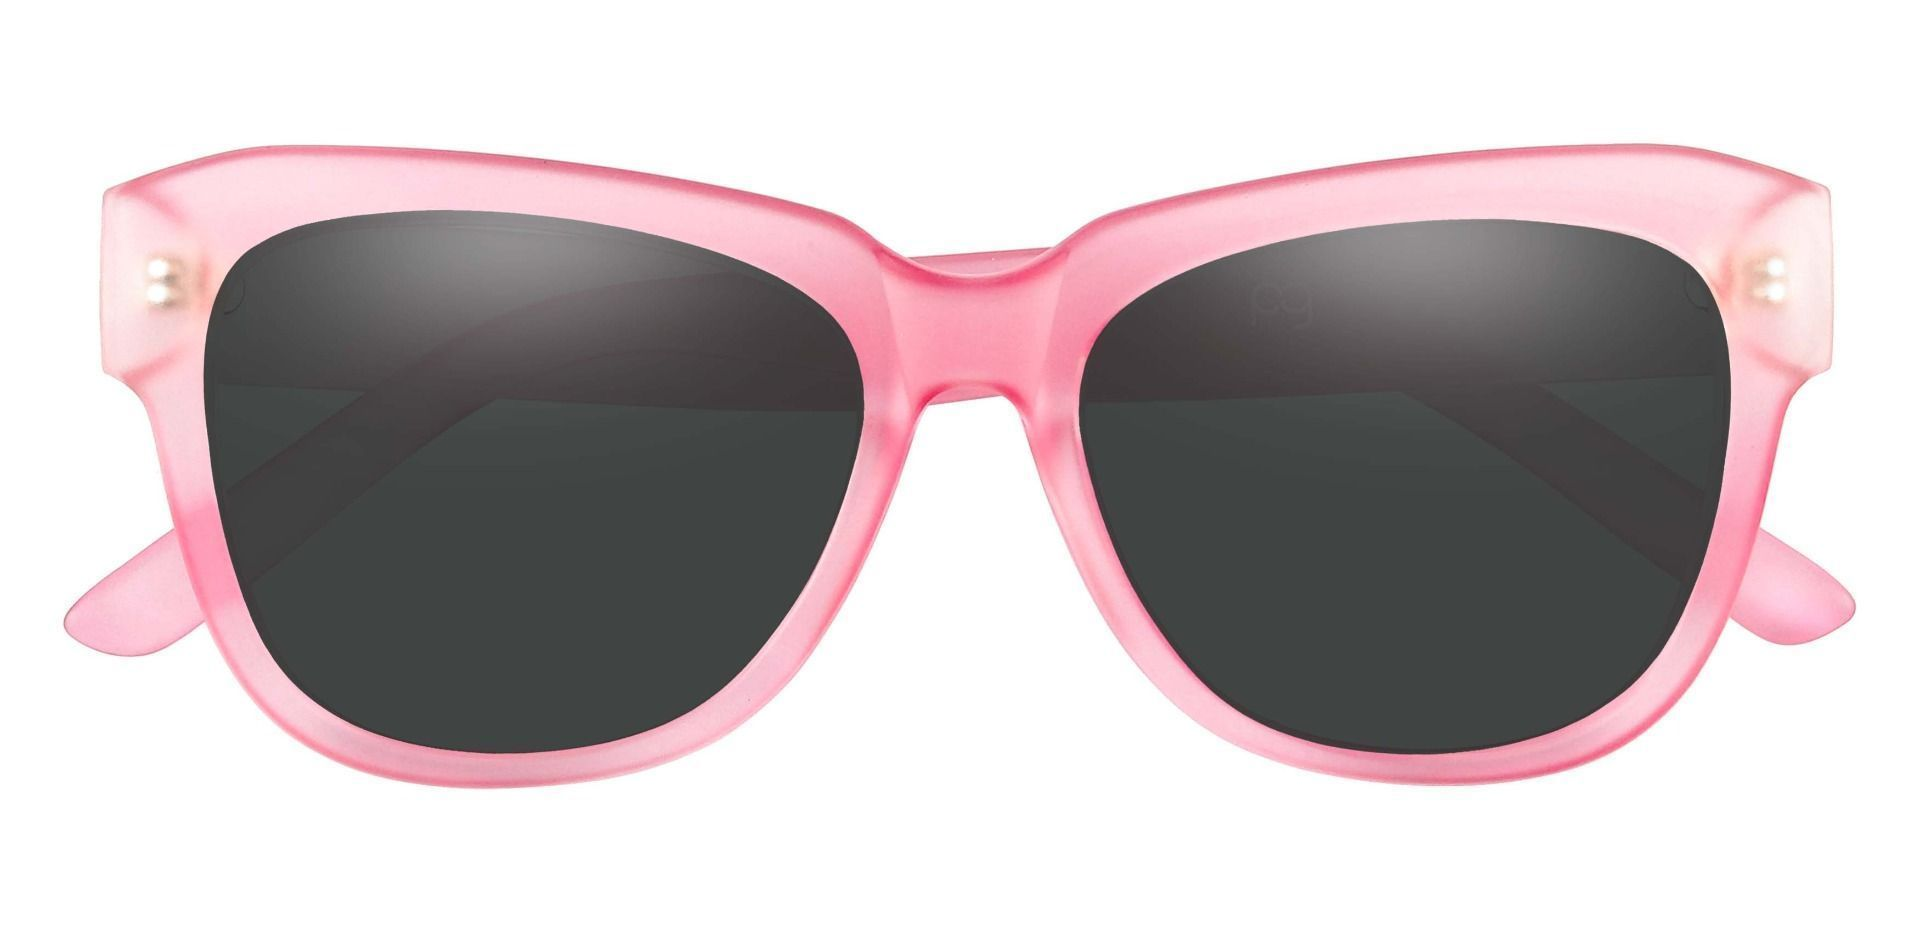 Gina Cat-Eye Progressive Sunglasses - Pink Frame With Gray Lenses